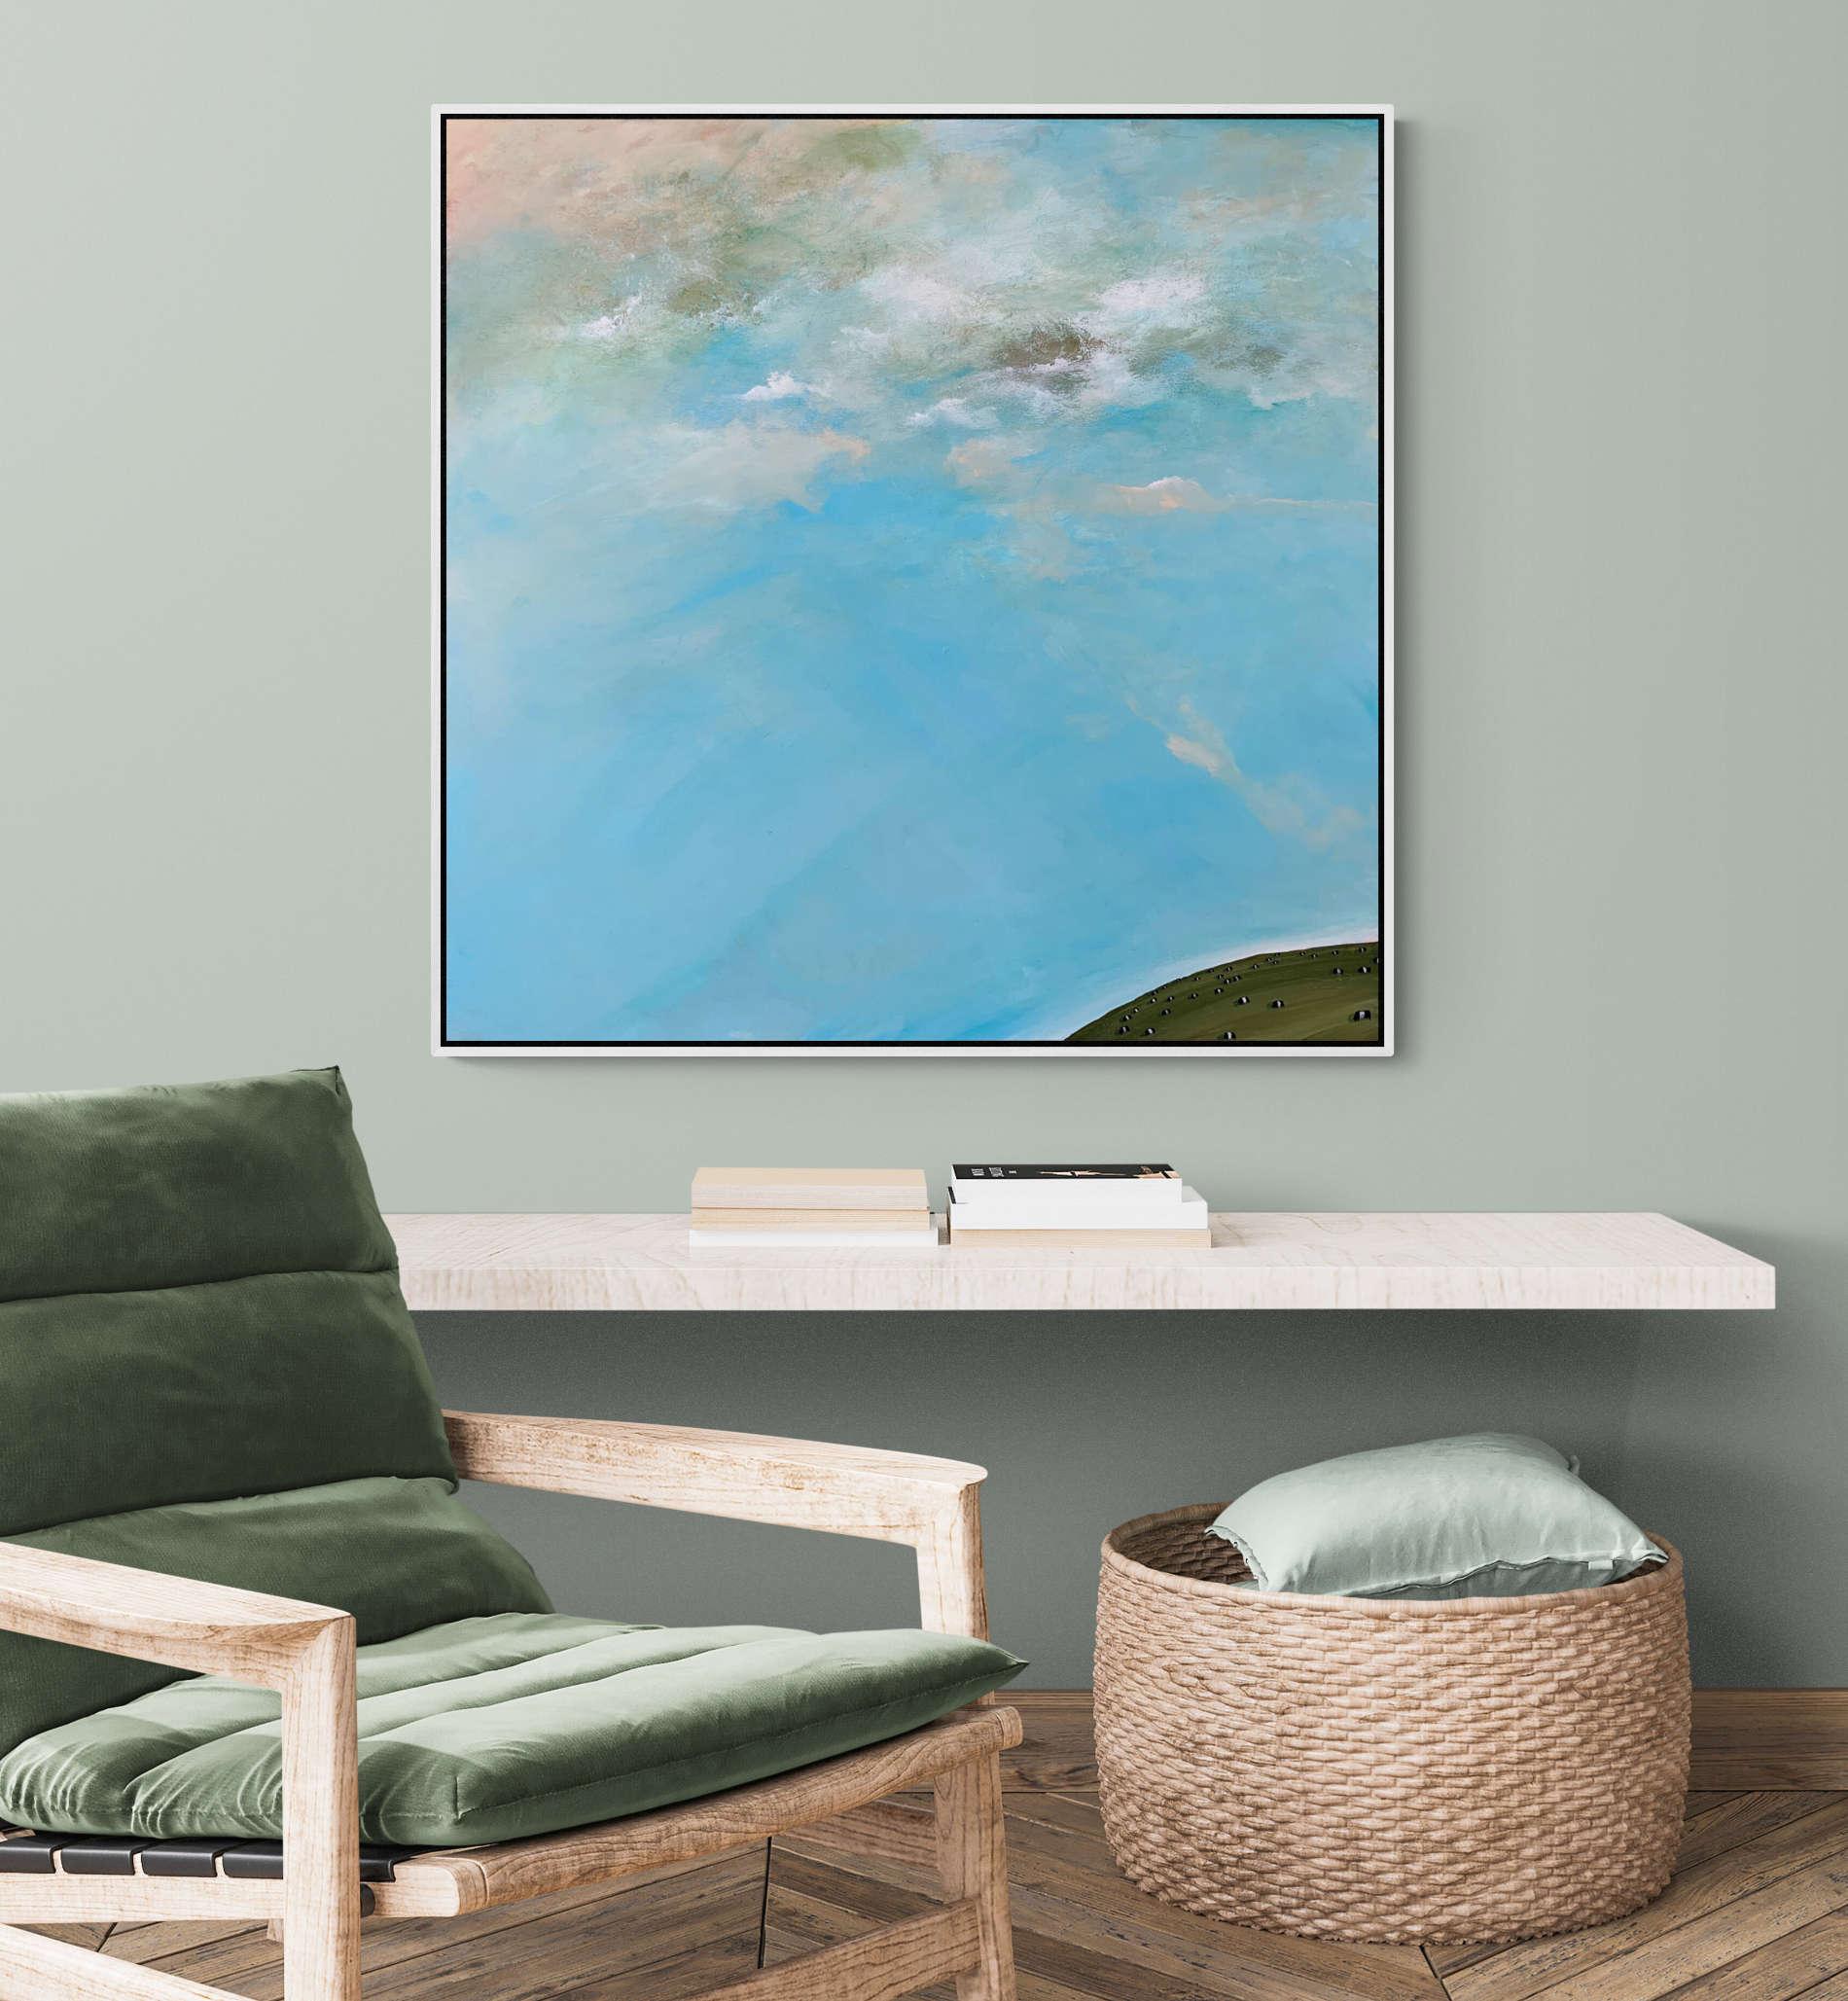 Tania Chanter Pasture Skies Landscape Artwork